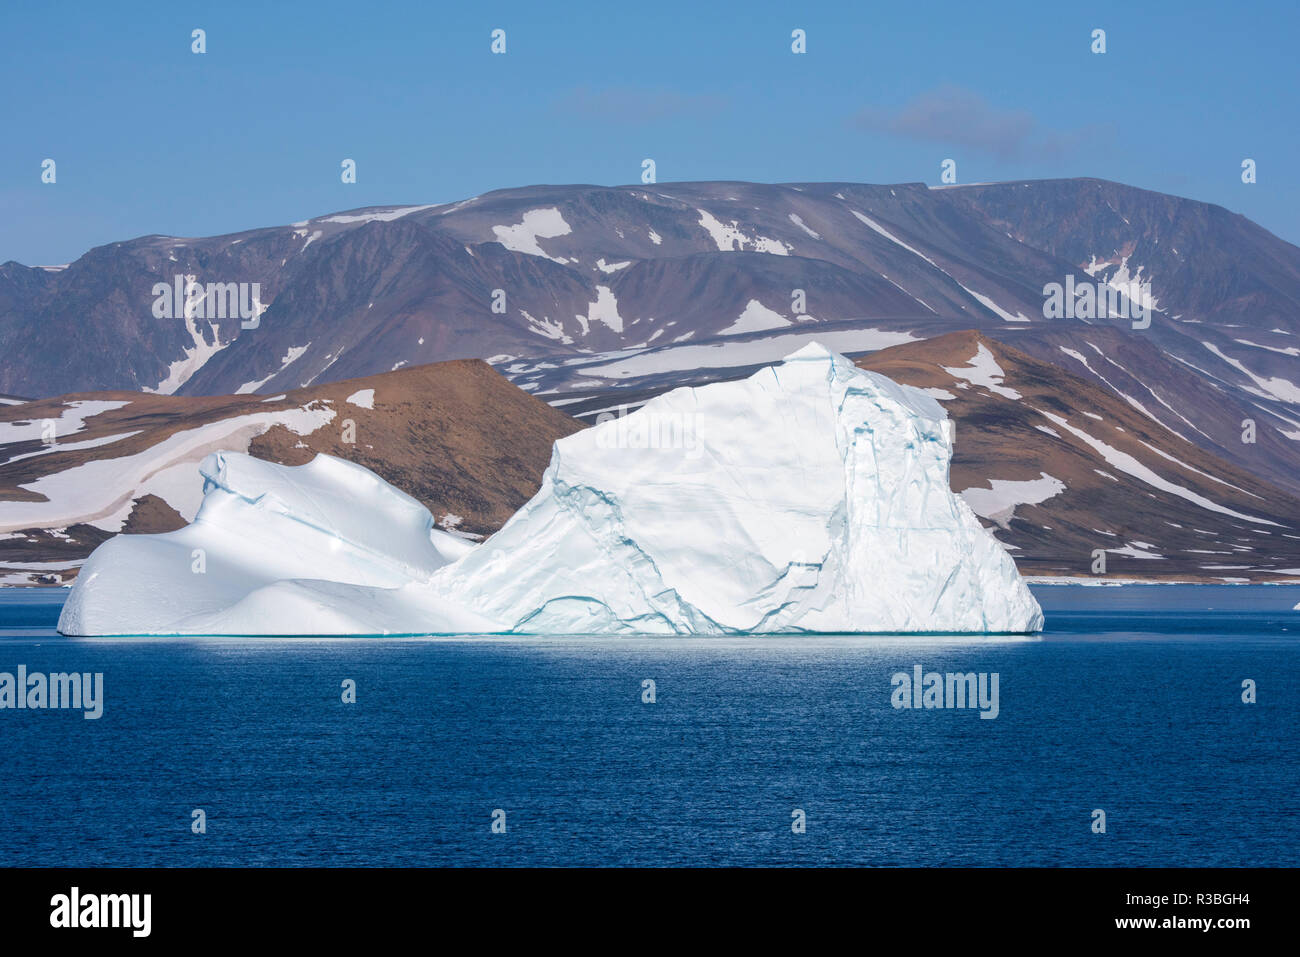 Greenland, Scoresbysund, aka Scoresby Sund. Large icebergs near Ittoqqortoormiit. Stock Photo